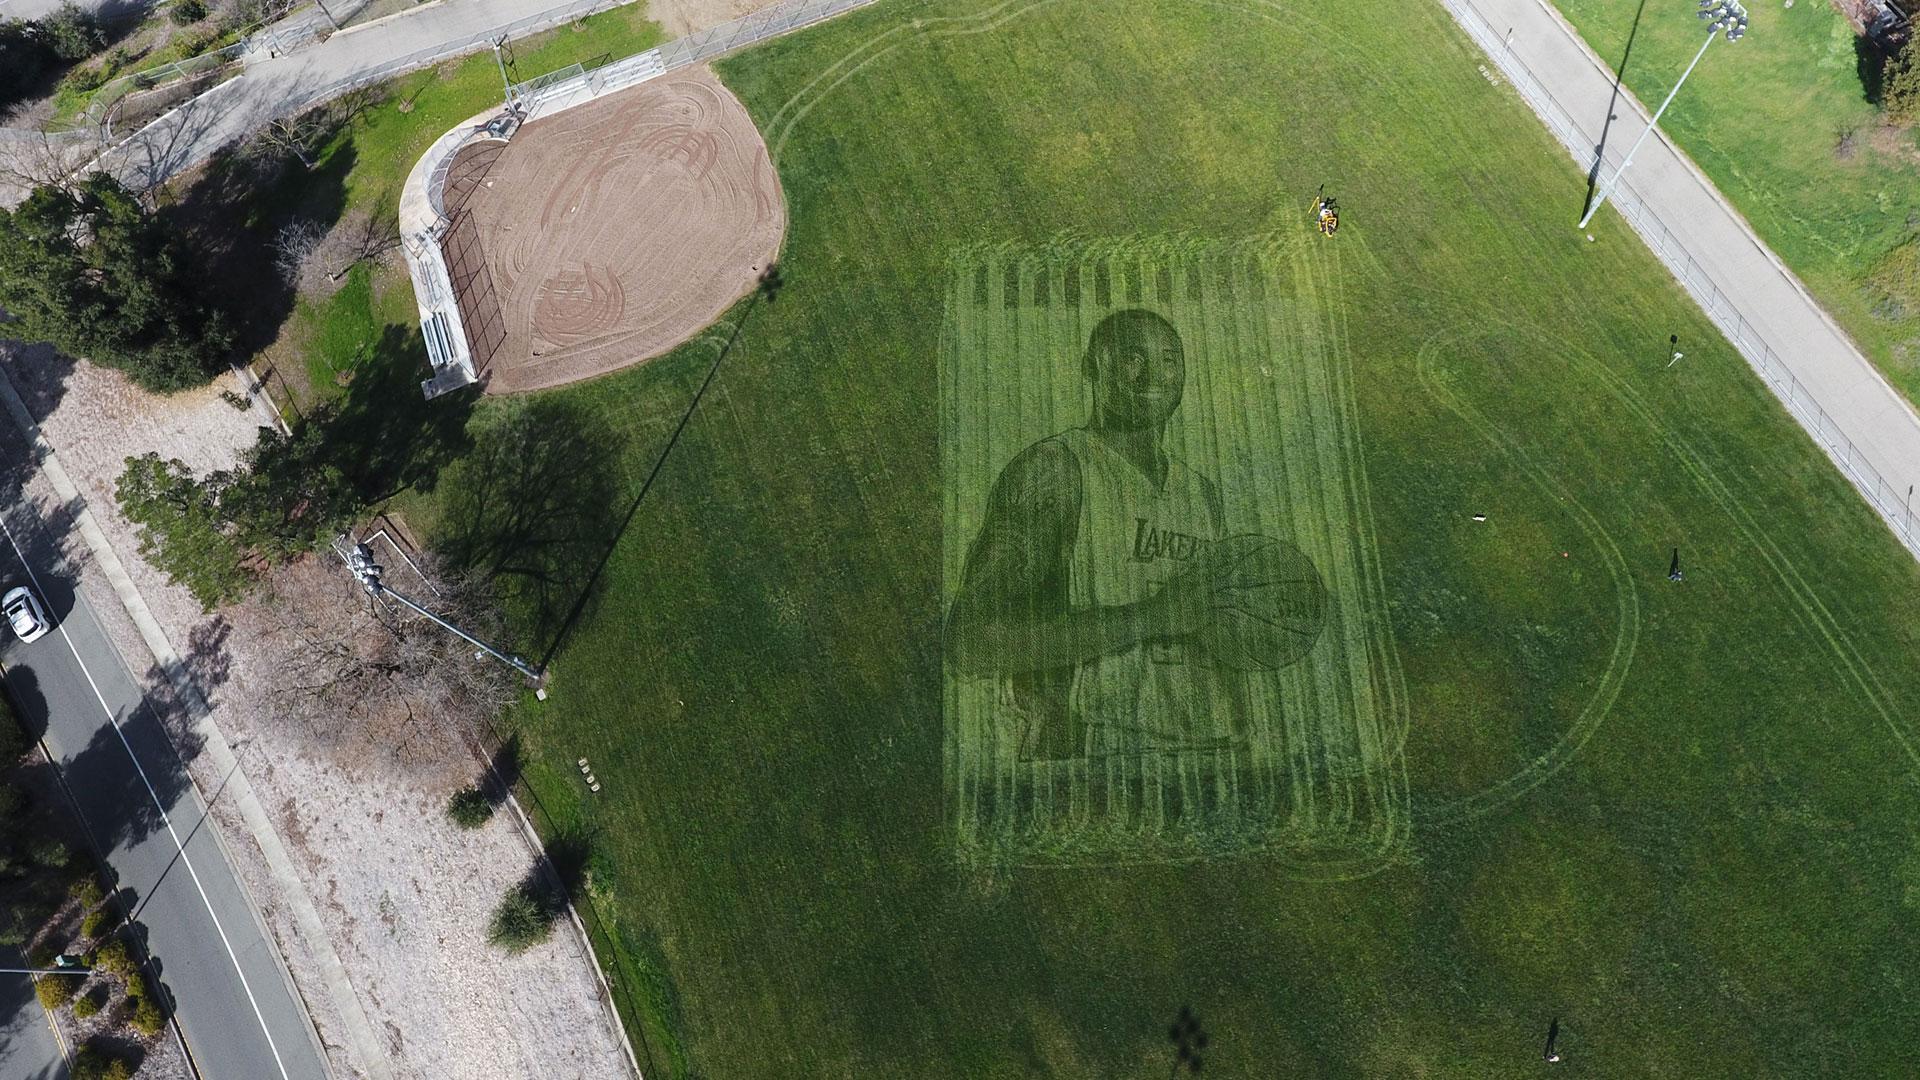 Kobe Bryant grass mural